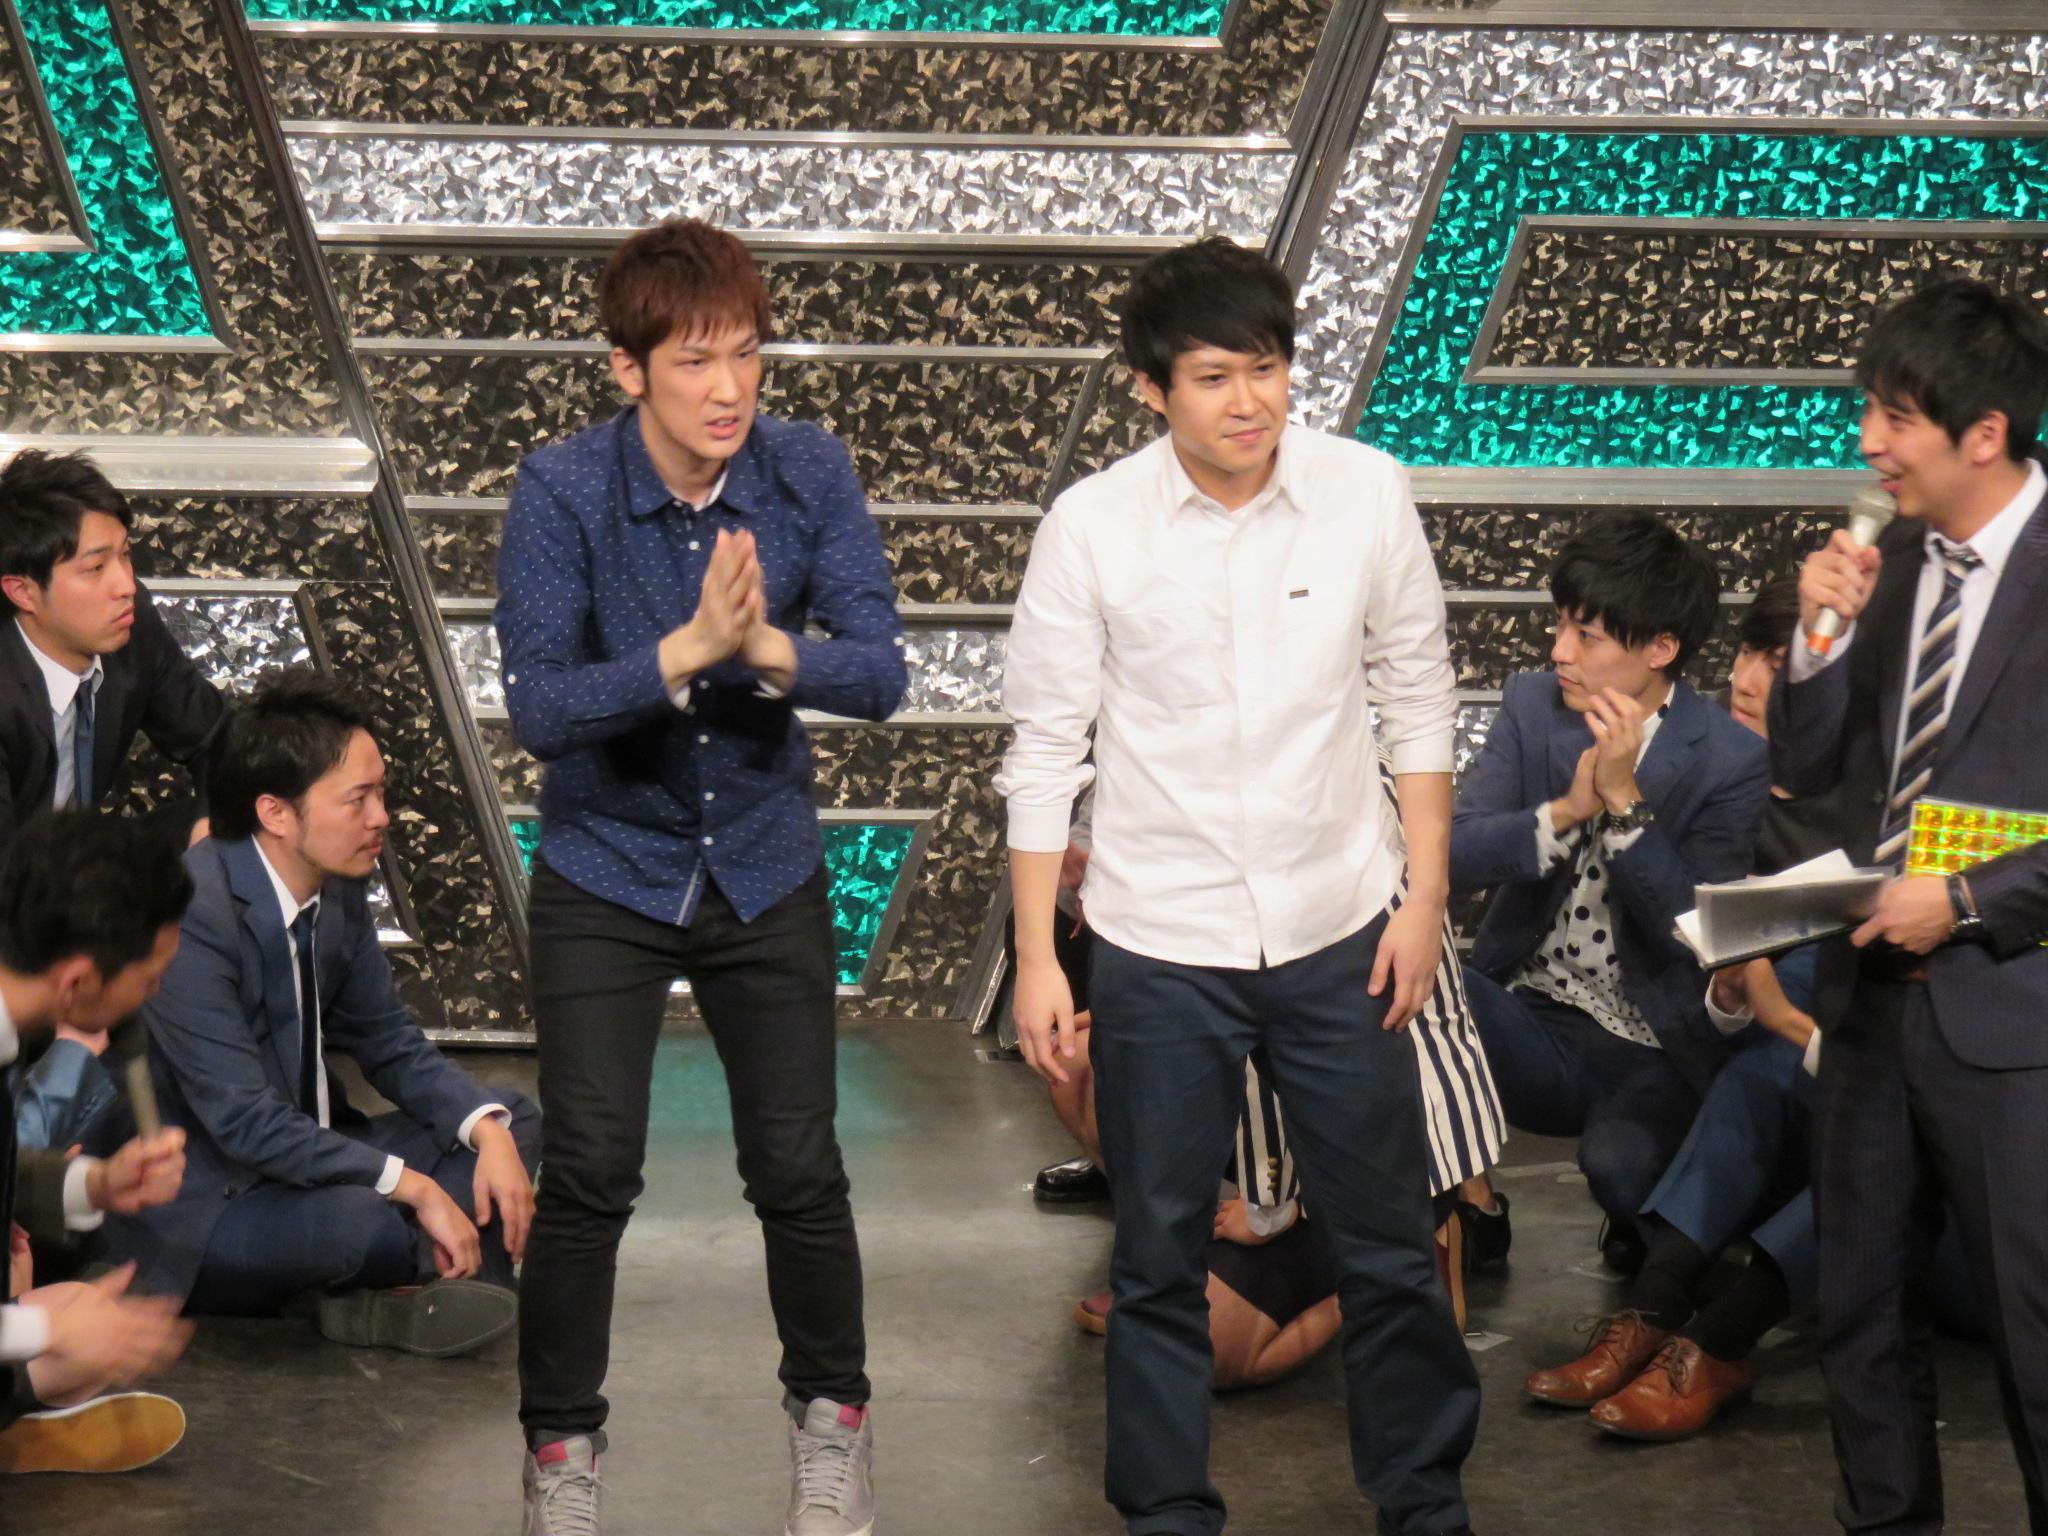 http://news.yoshimoto.co.jp/20151130225233-ee00274bc29a2b6447c1a1f4f8b50c6109c09029.jpg